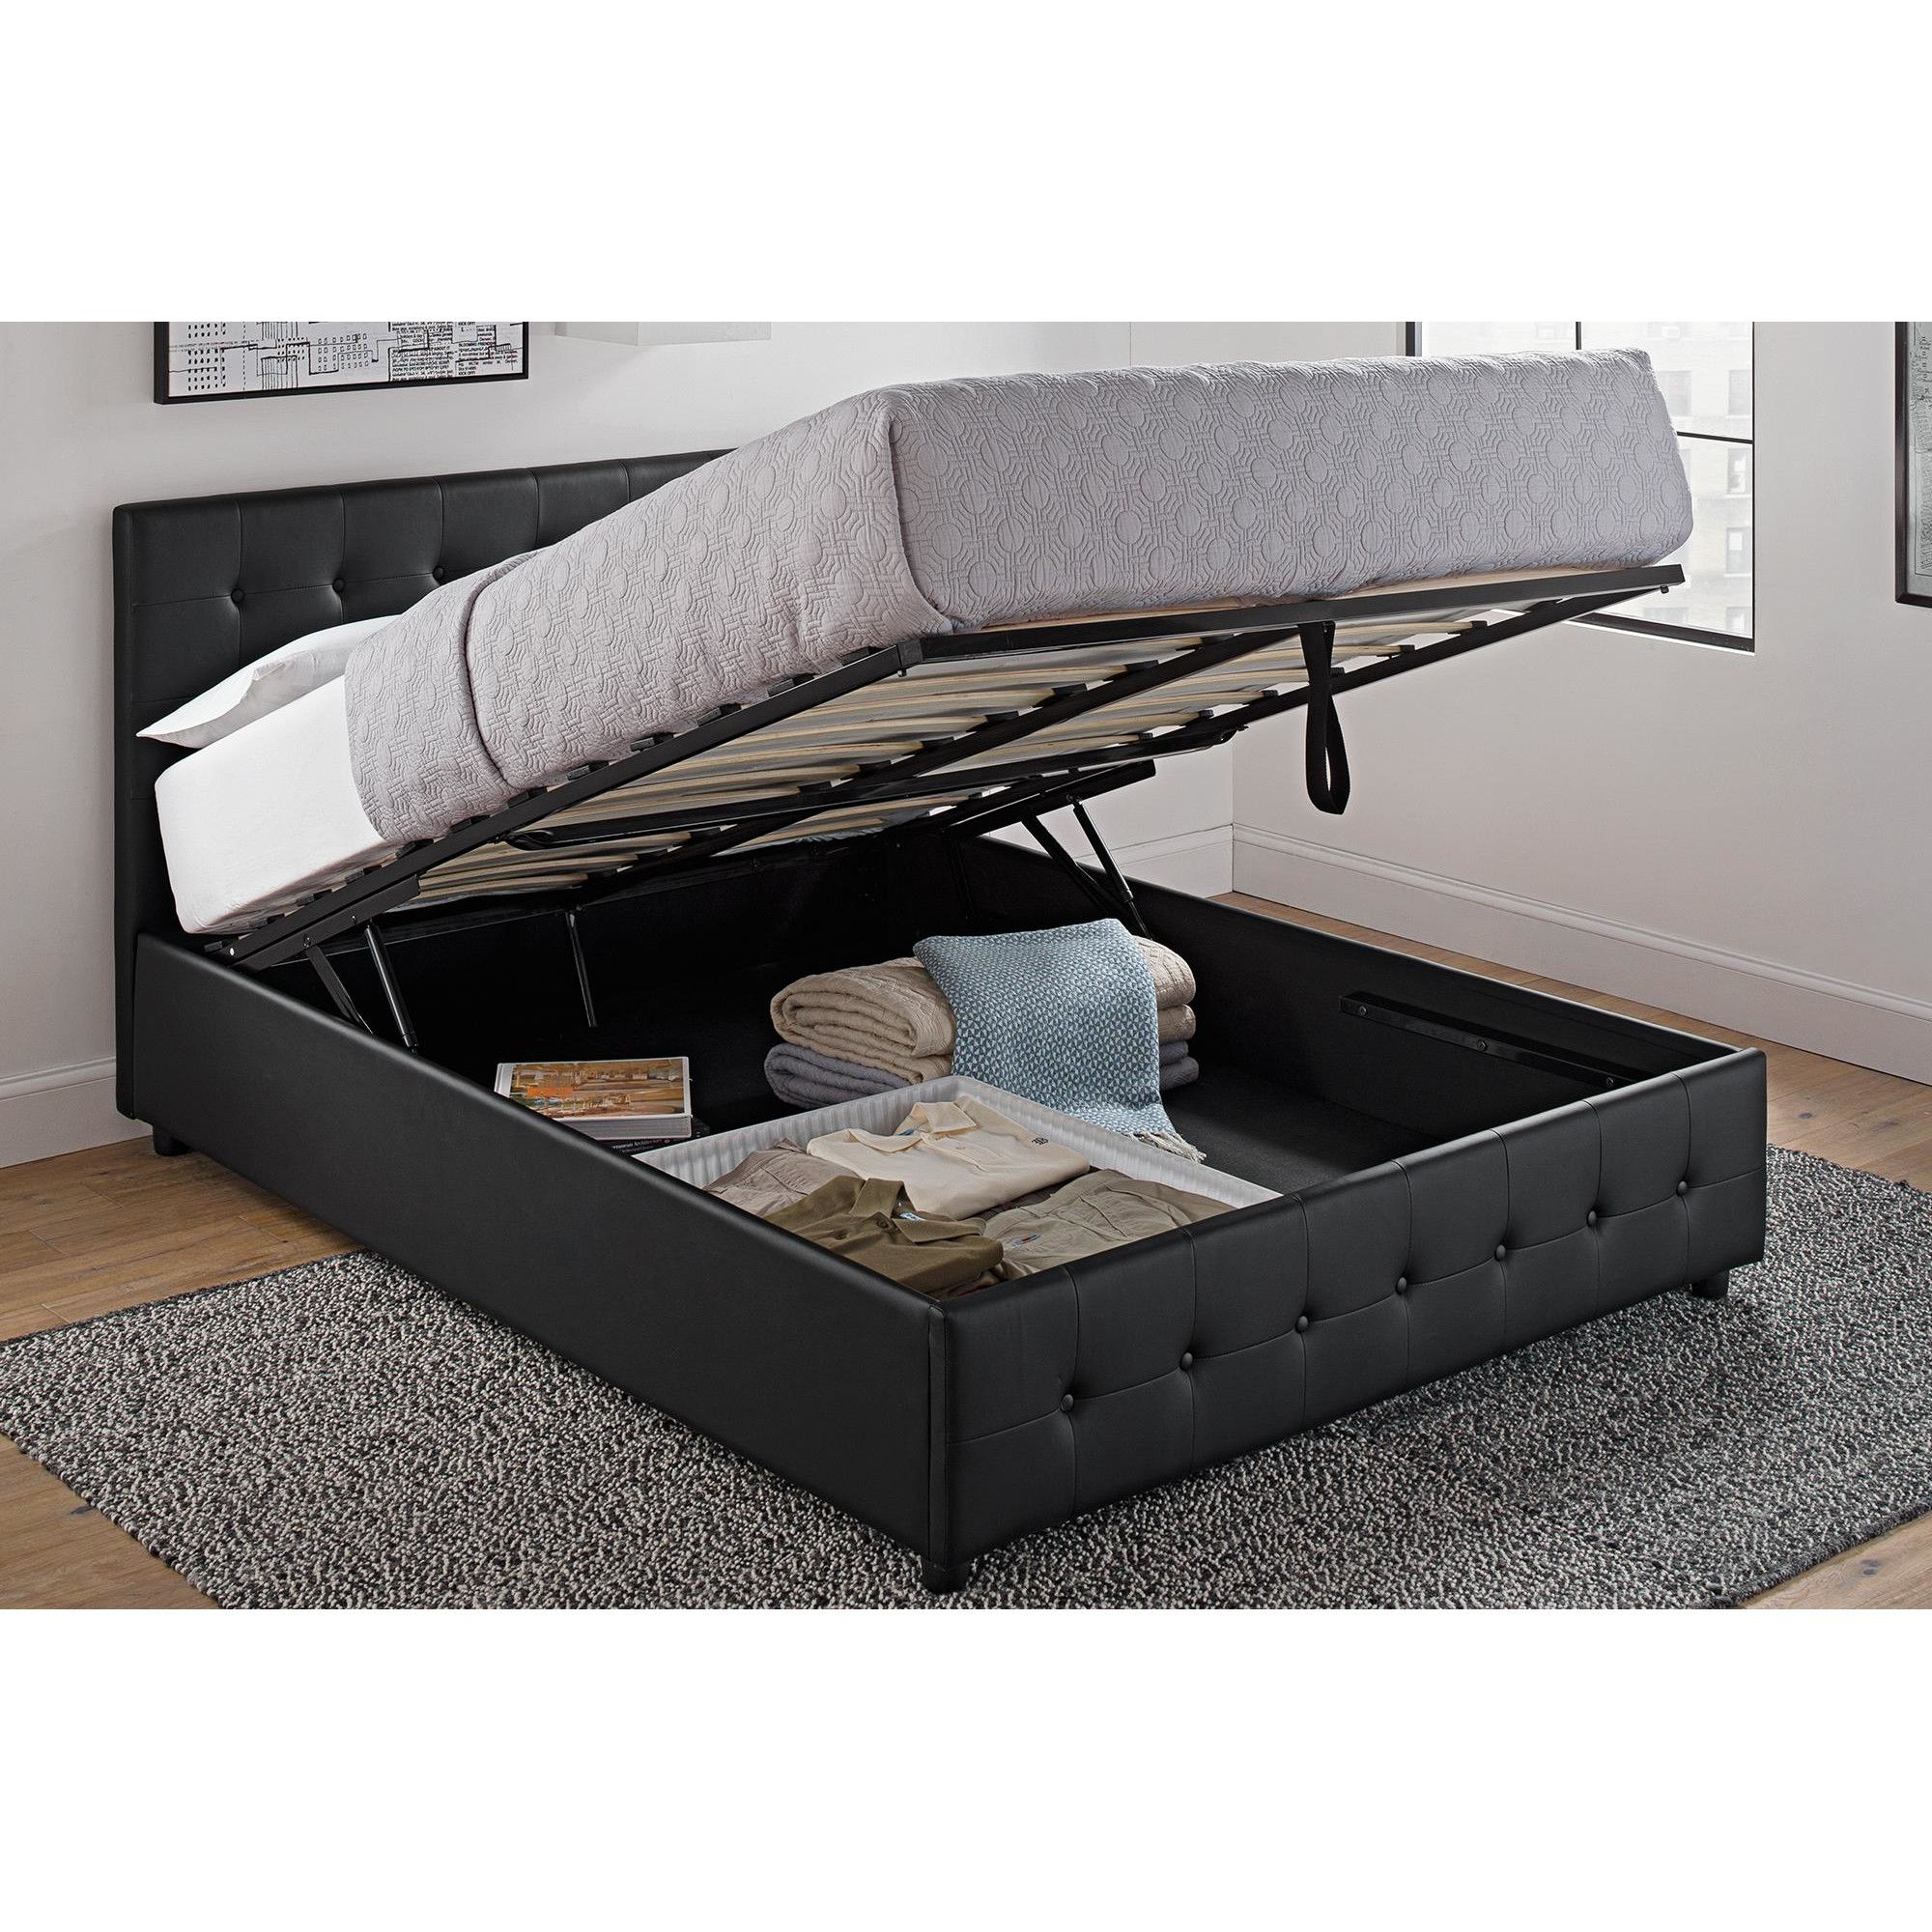 Morphis Upholstered Platform Bed